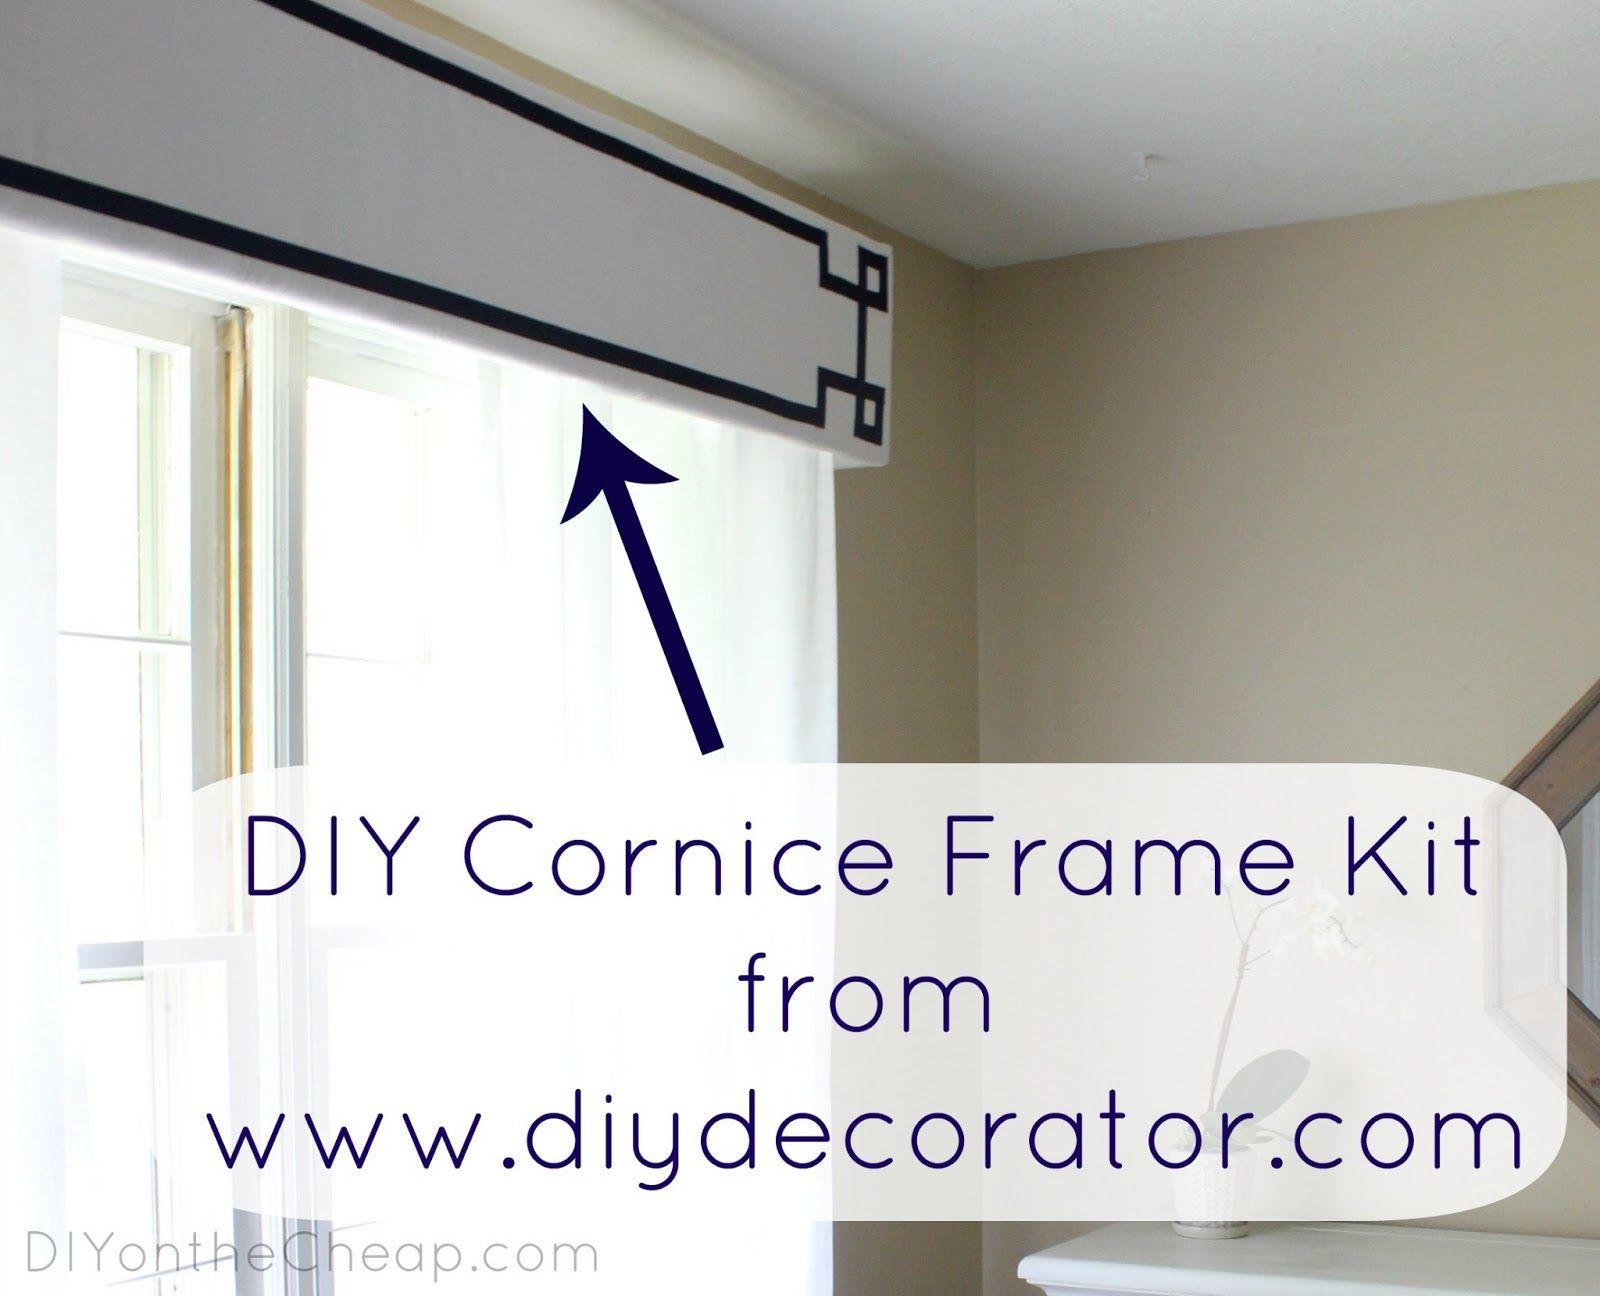 New Window Treatments Diy Cornice Frame Kit Review Diy Window